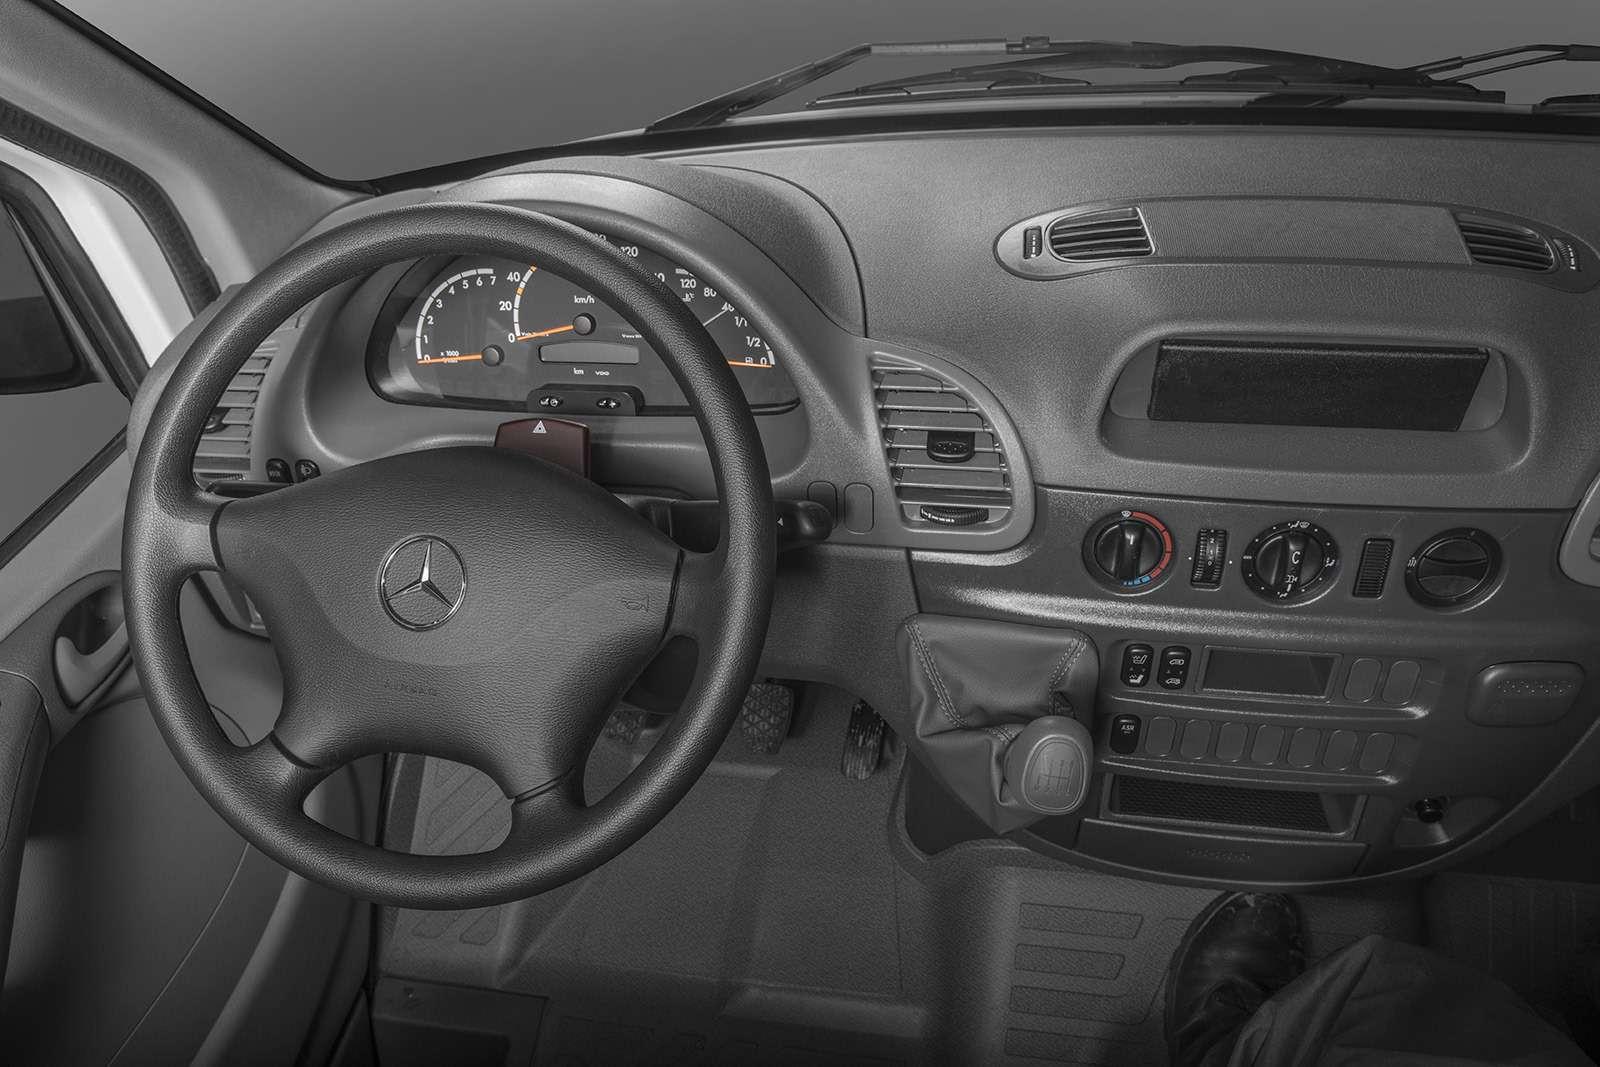 Mercedes-Benz Sprinter Classic лишился звезды накапоте. Заодно иподорожал— фото 859181